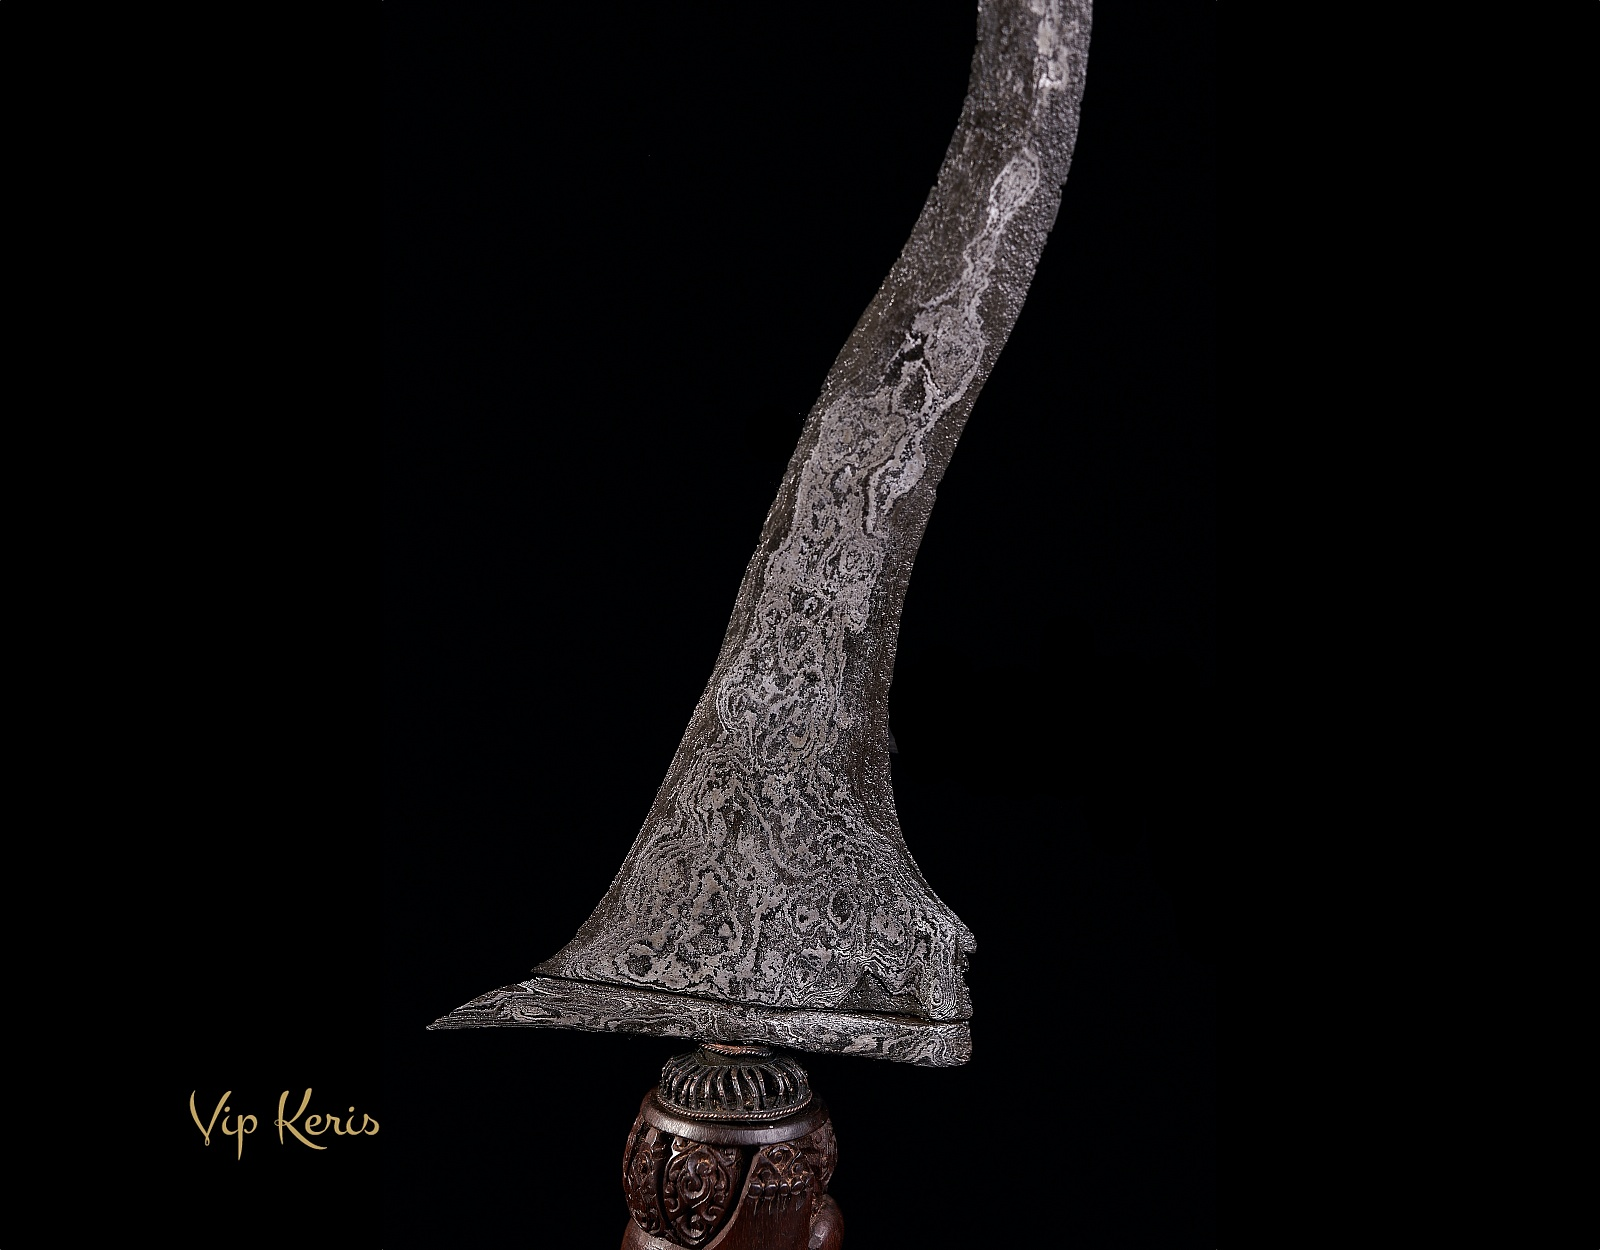 Индонезийский кинжал Крис Sempomo фото VipKeris